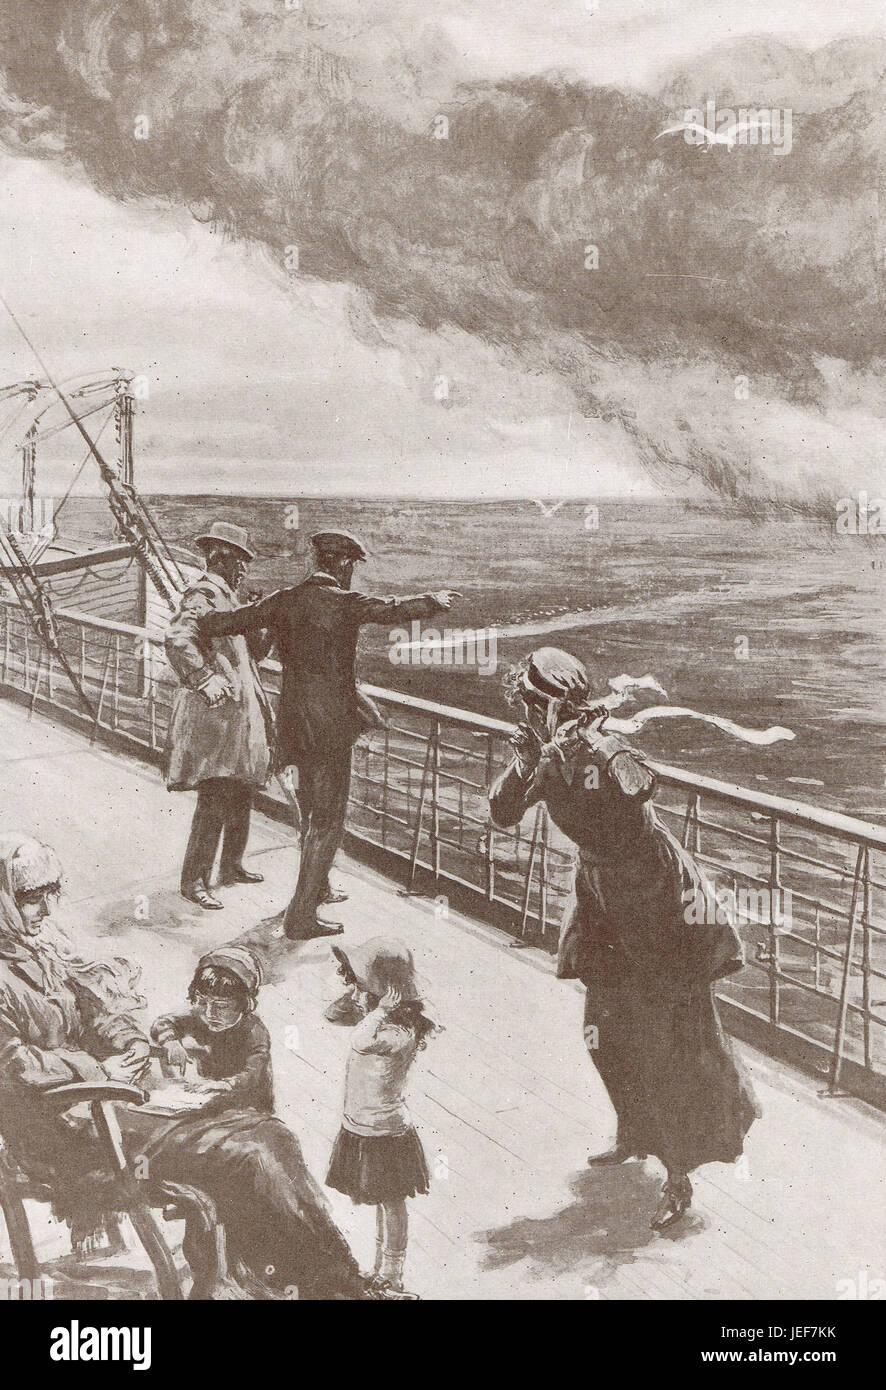 German U Boat Torpedo approaching Cunard Liner RMS Lusitania, 7 May 1915 - Stock Image